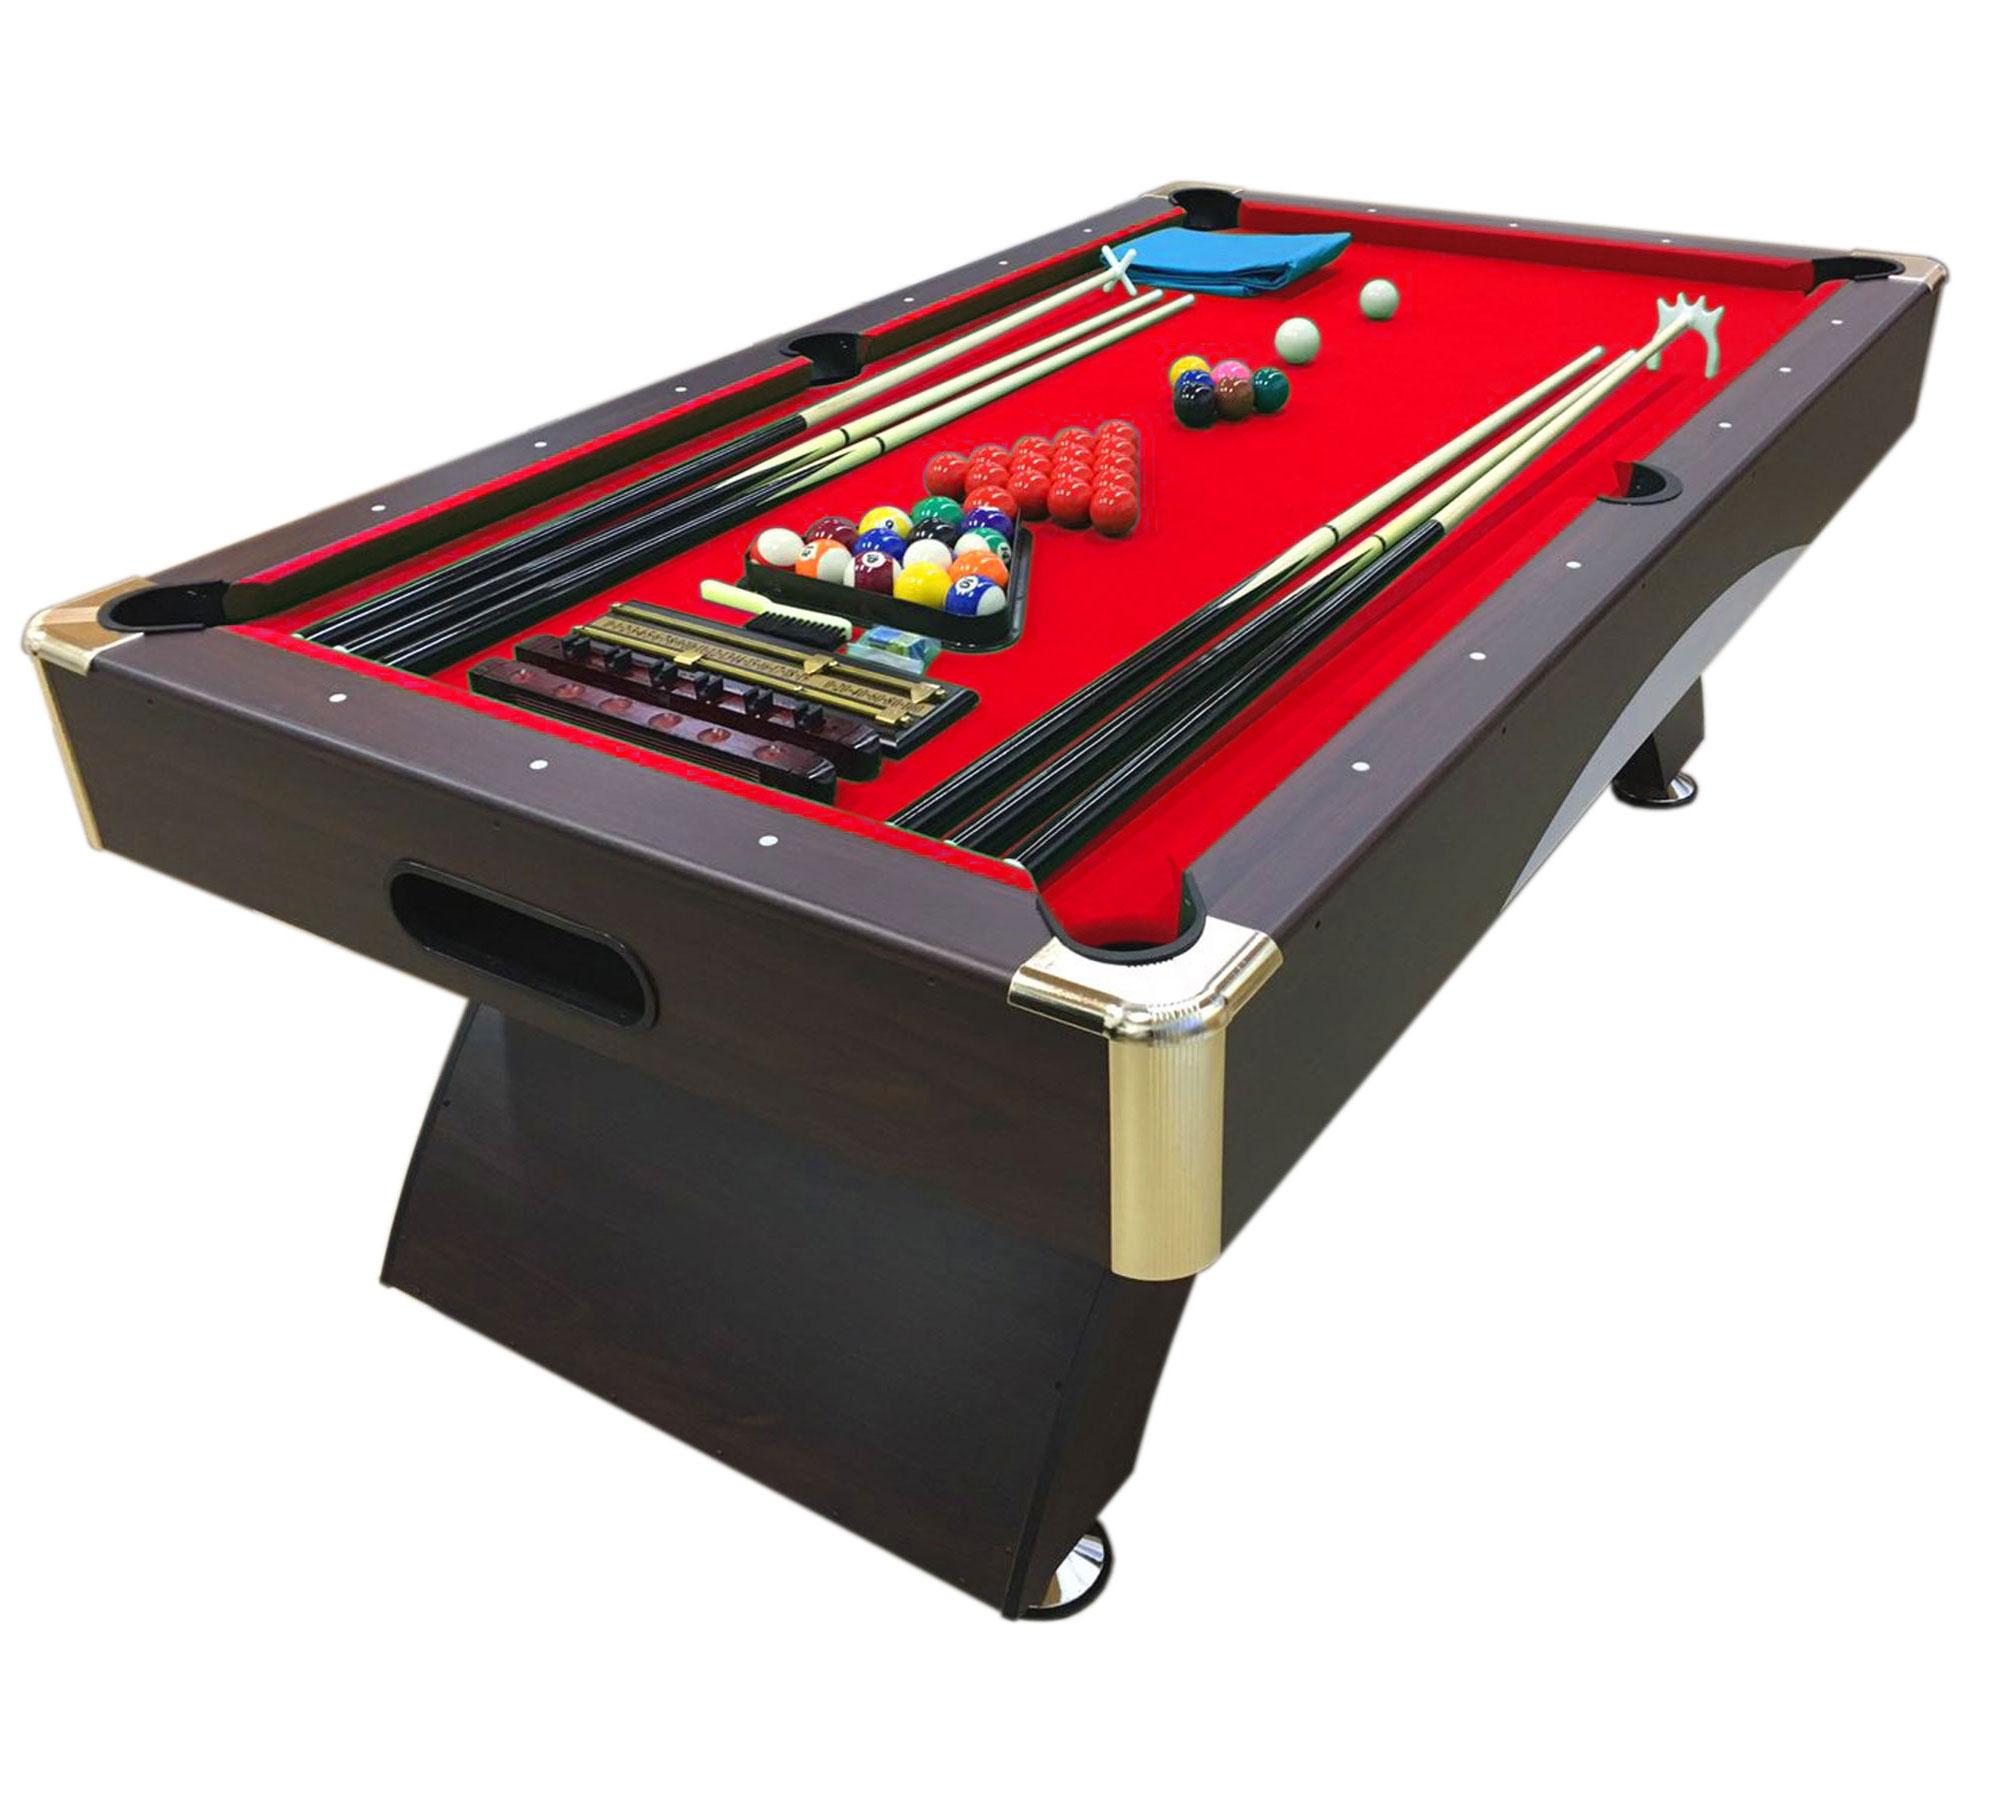 Mesa de billar juegos de billar pool 7 ft carambola full medici n 188 x 96 cm ebay - Medidas mesa billar ...